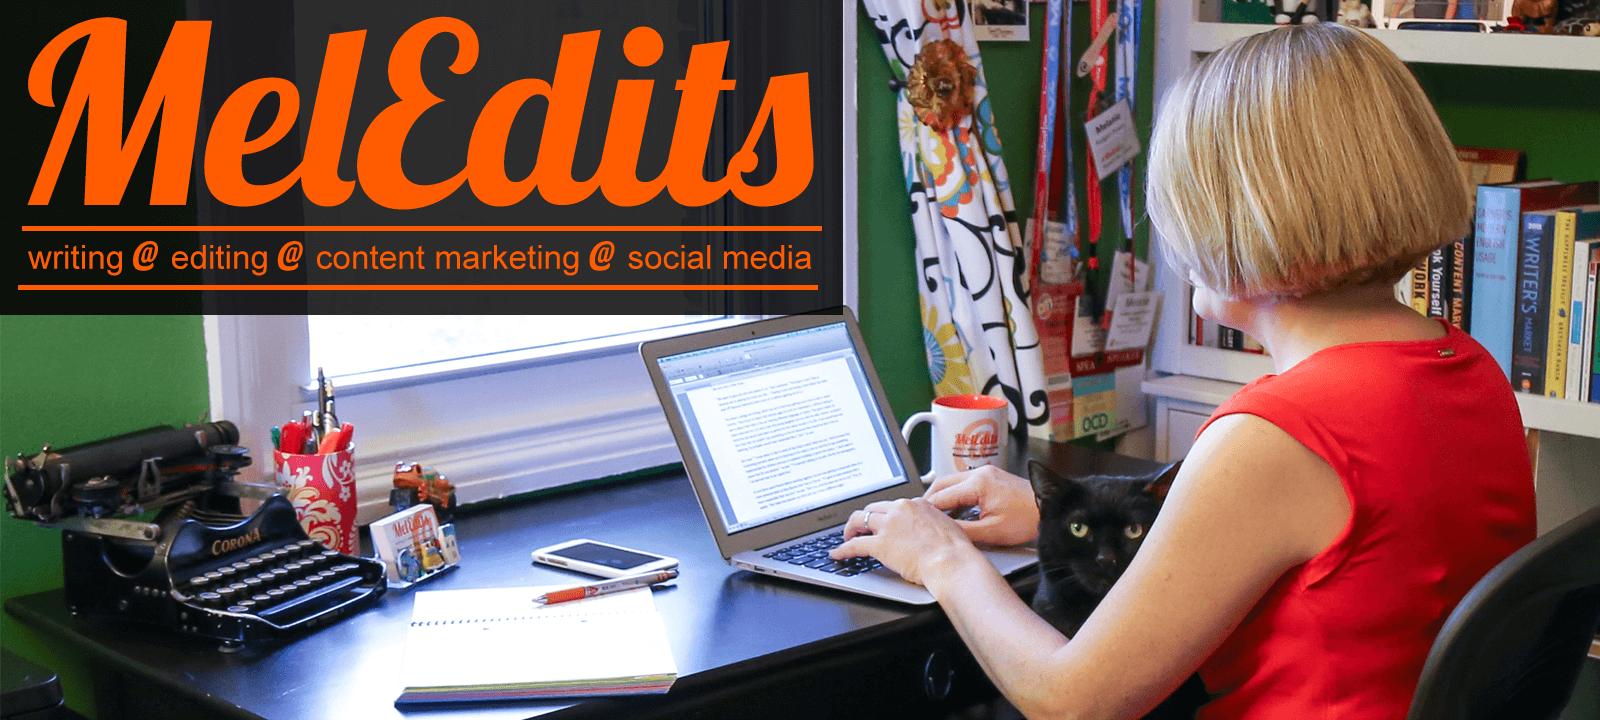 MelEdits - writing, editing, content marketing, social media - www.meledits.com